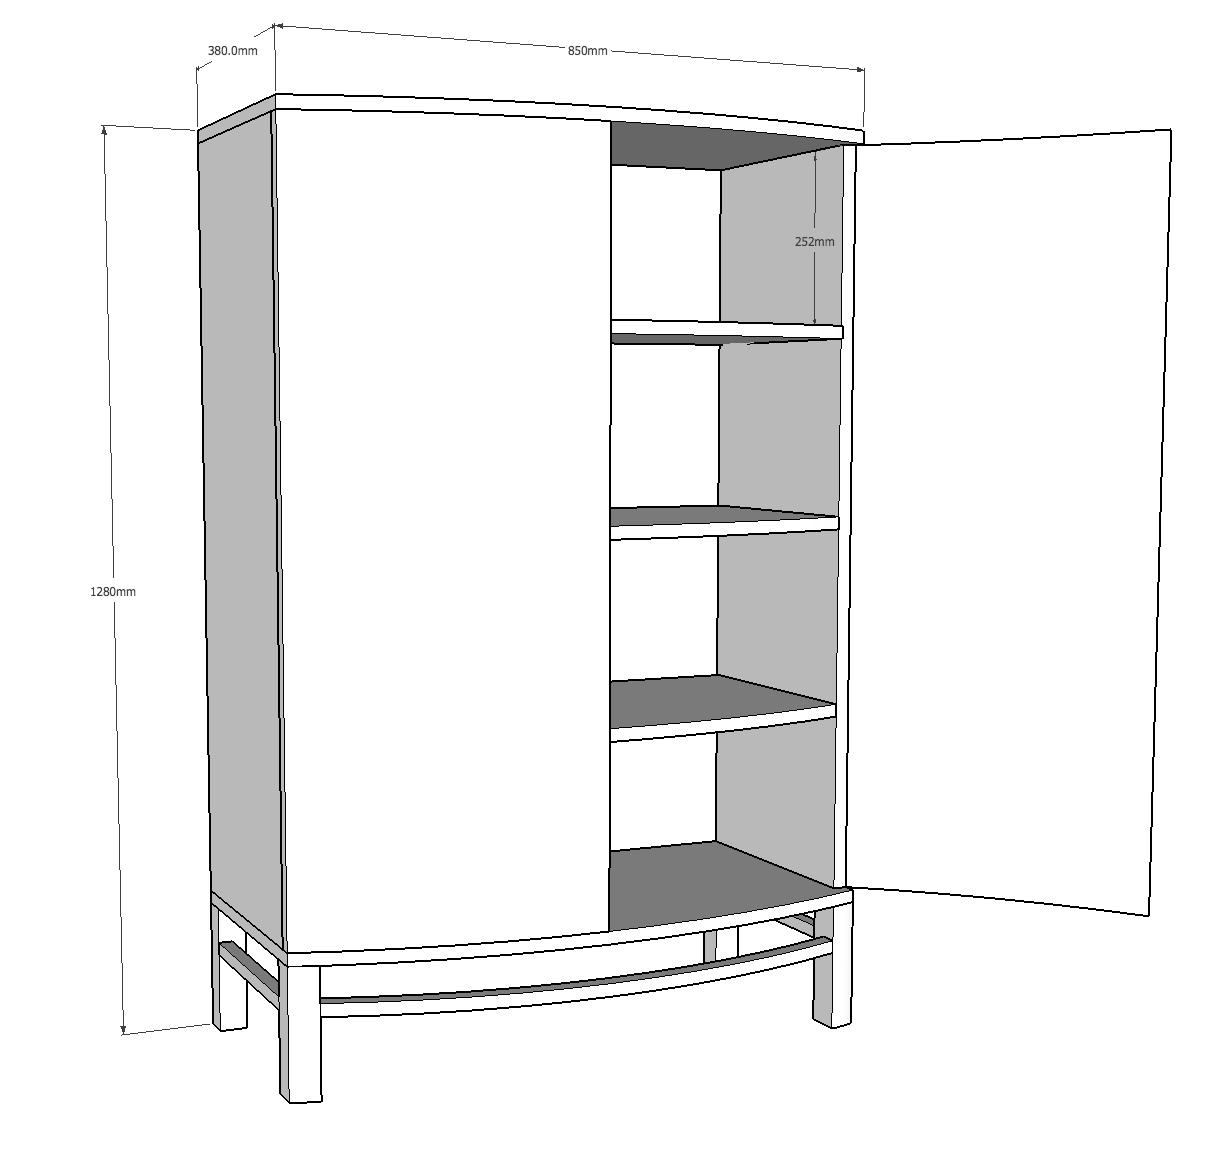 three curved shelves 25cm high